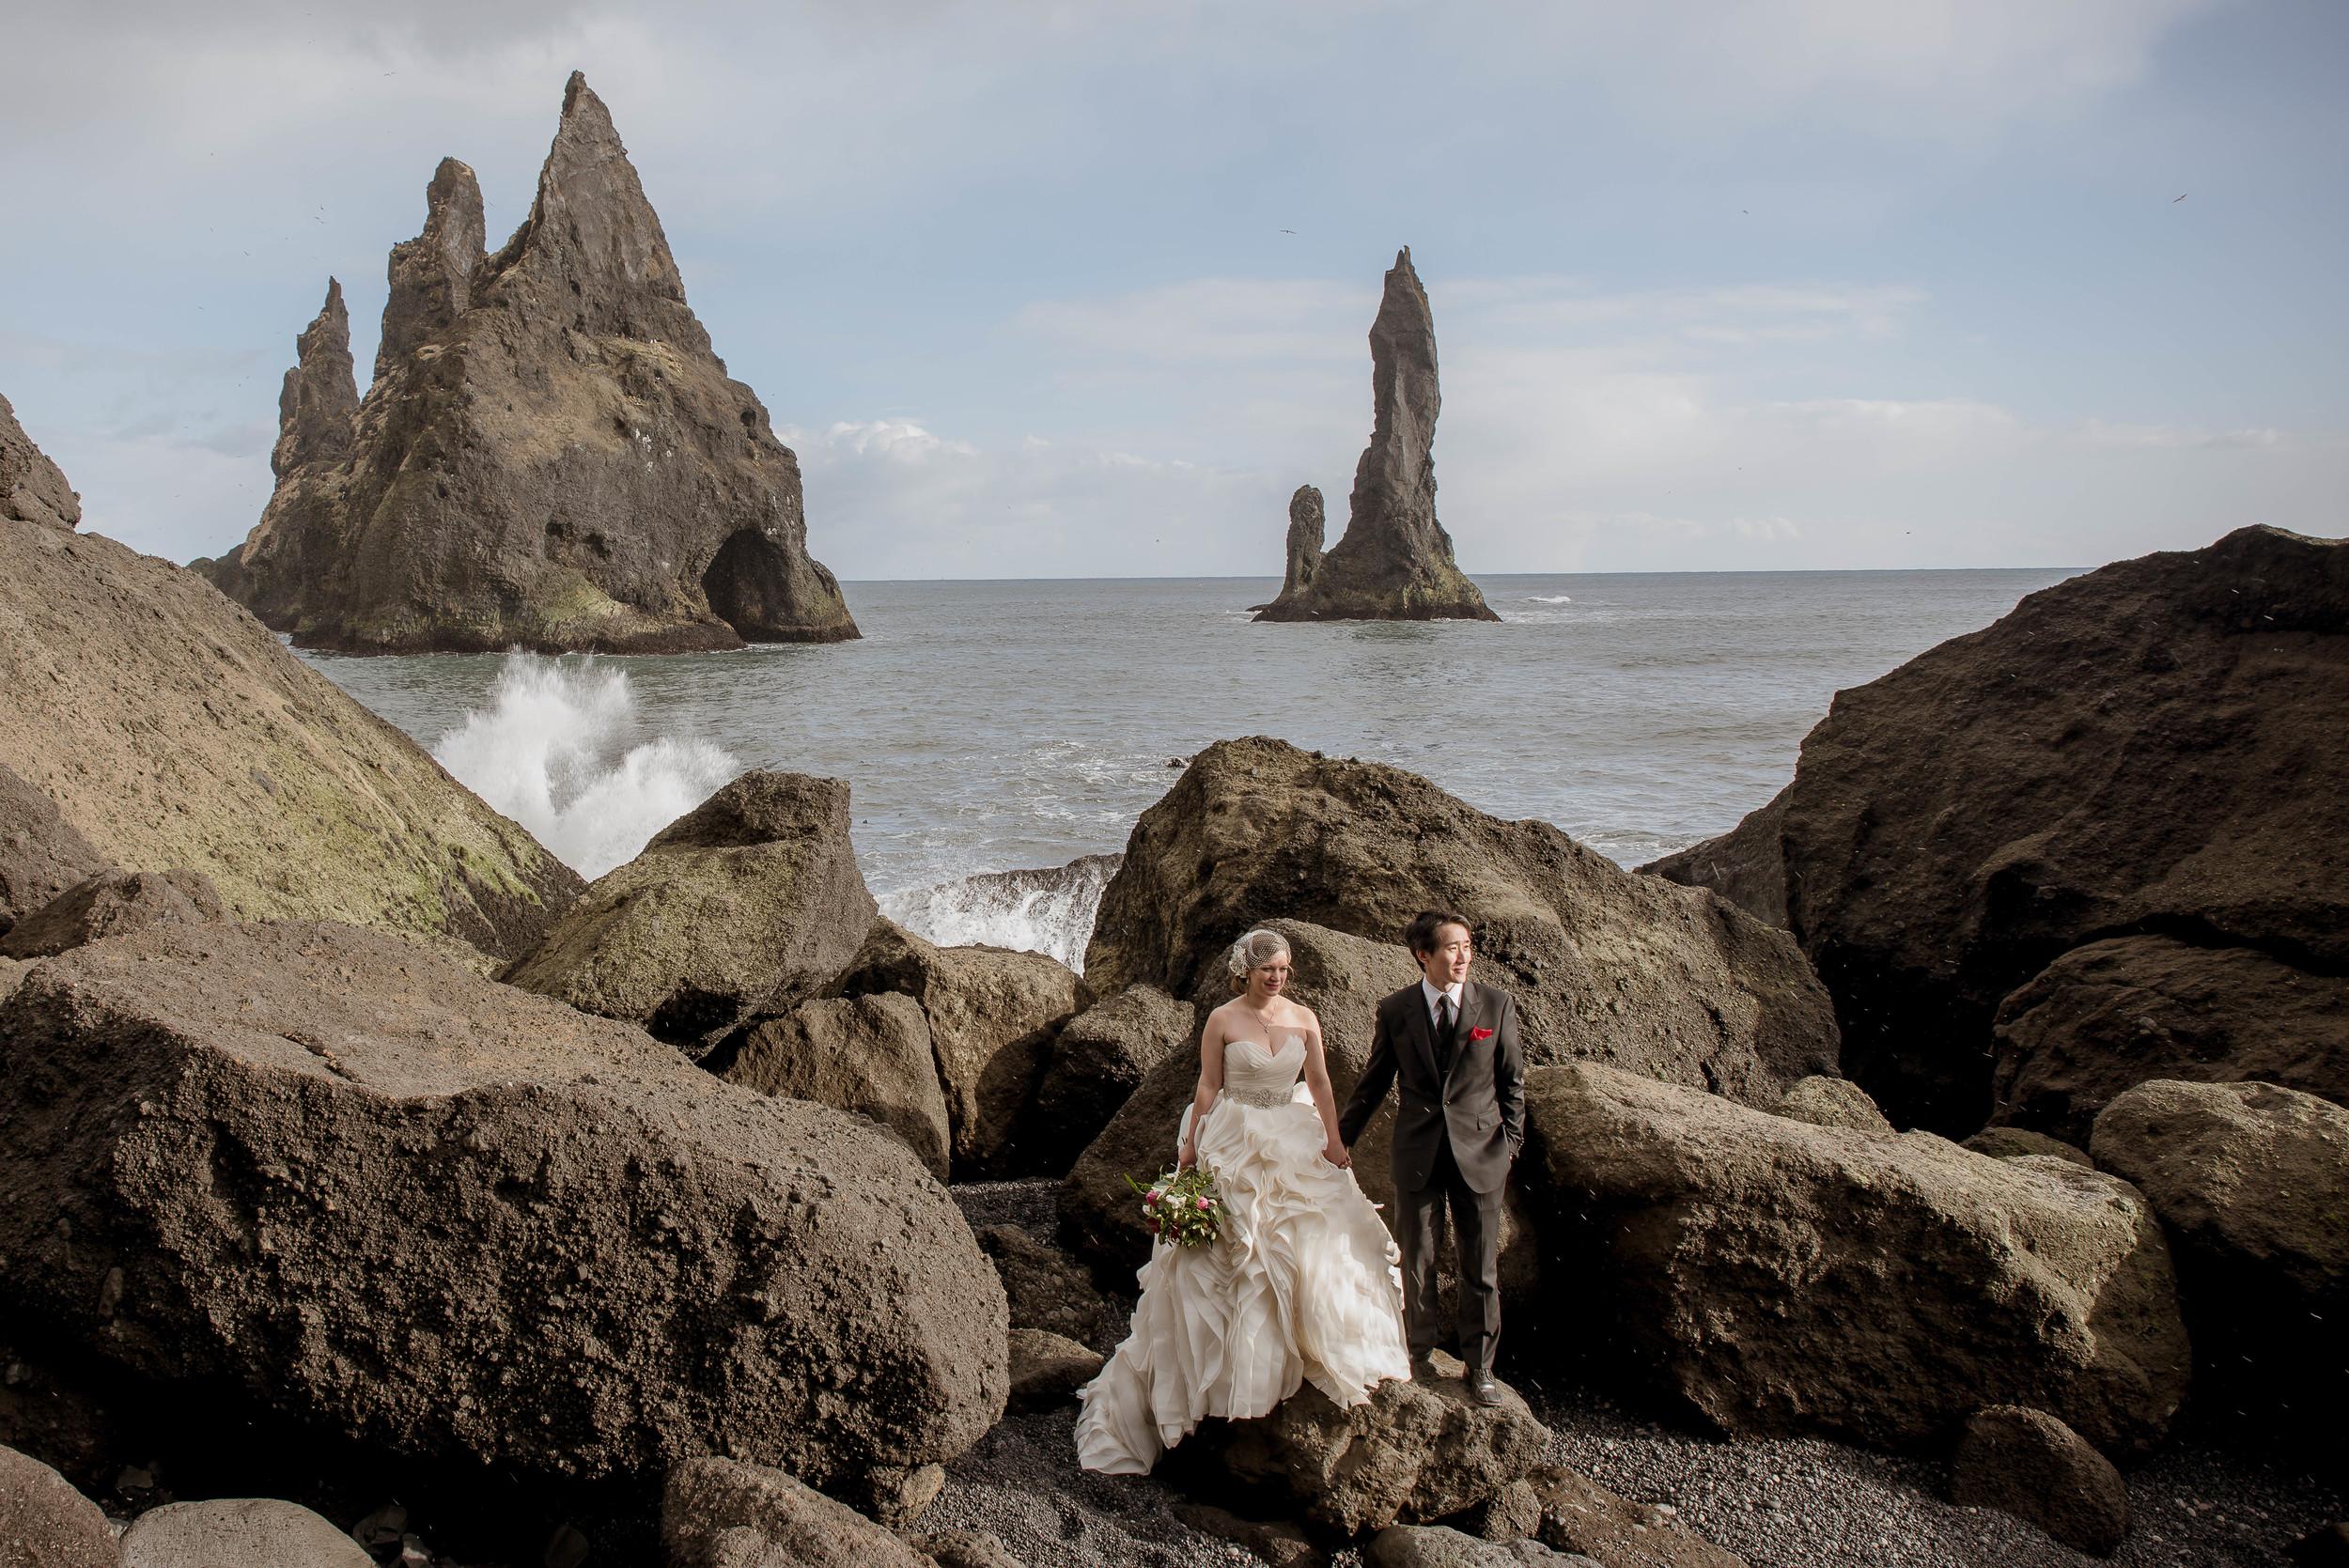 Iceland Glacier Lagoon Wedding Photographer-1.jpg